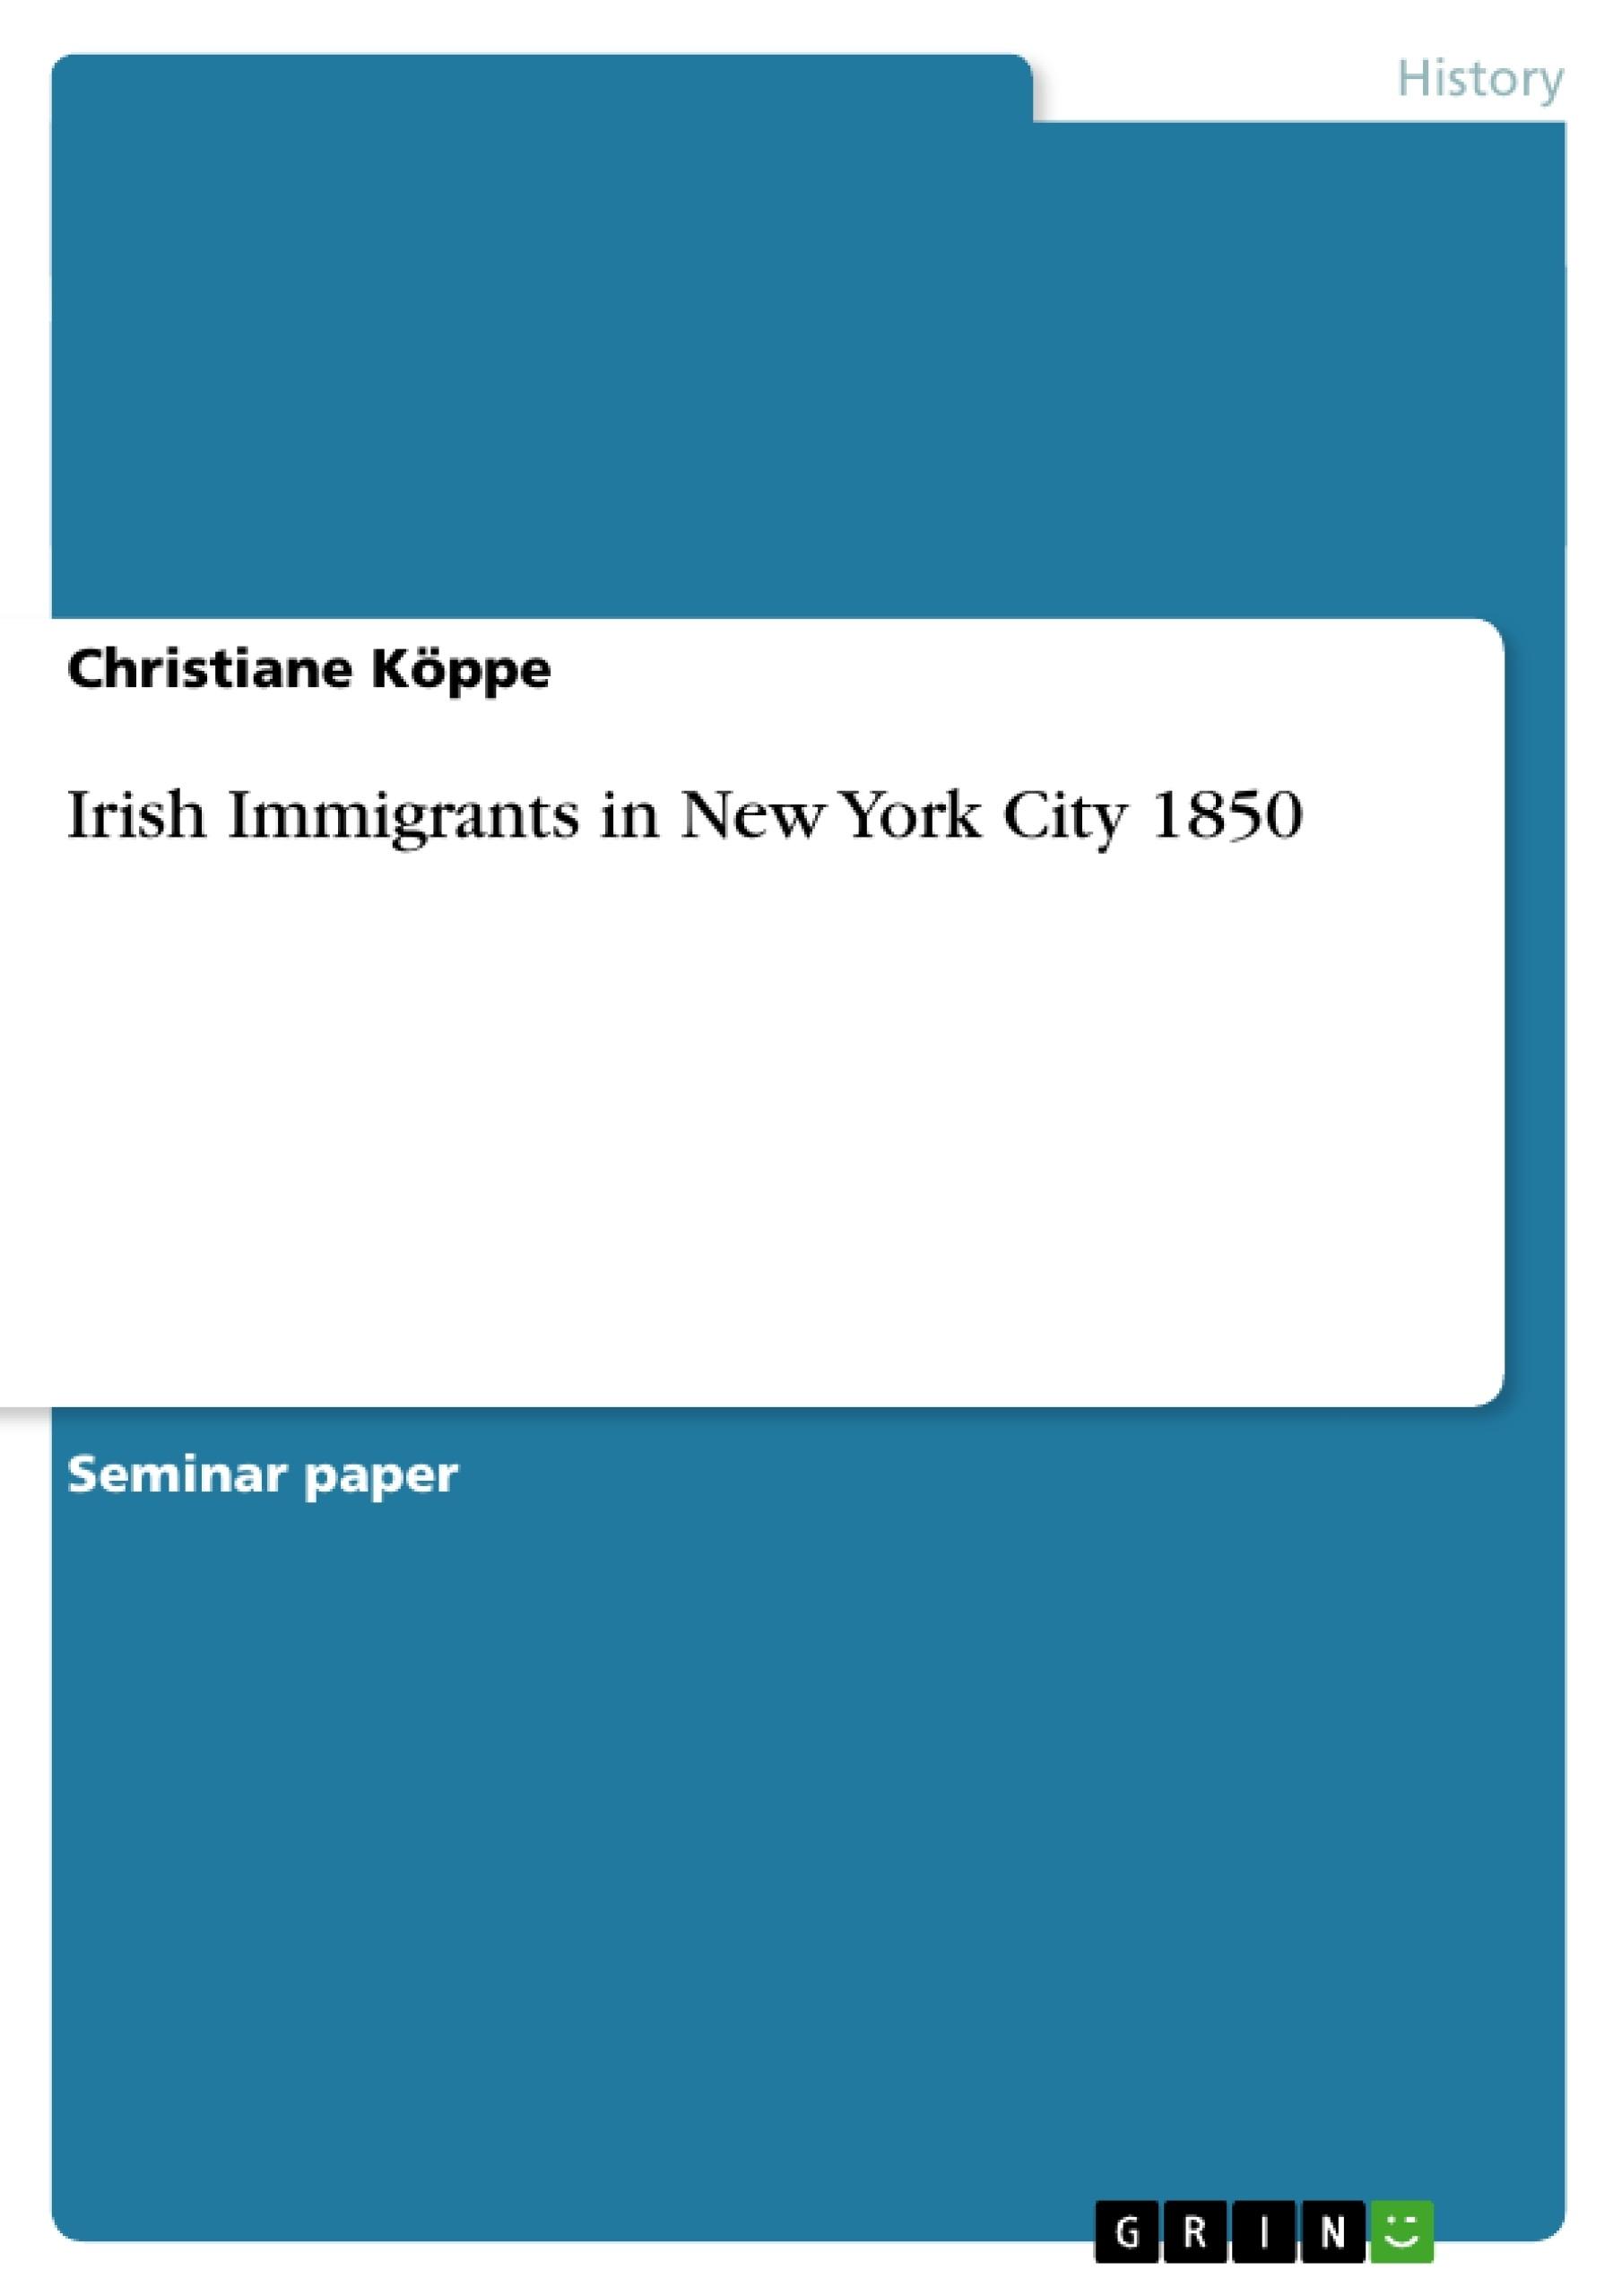 Title: Irish Immigrants in New York City 1850